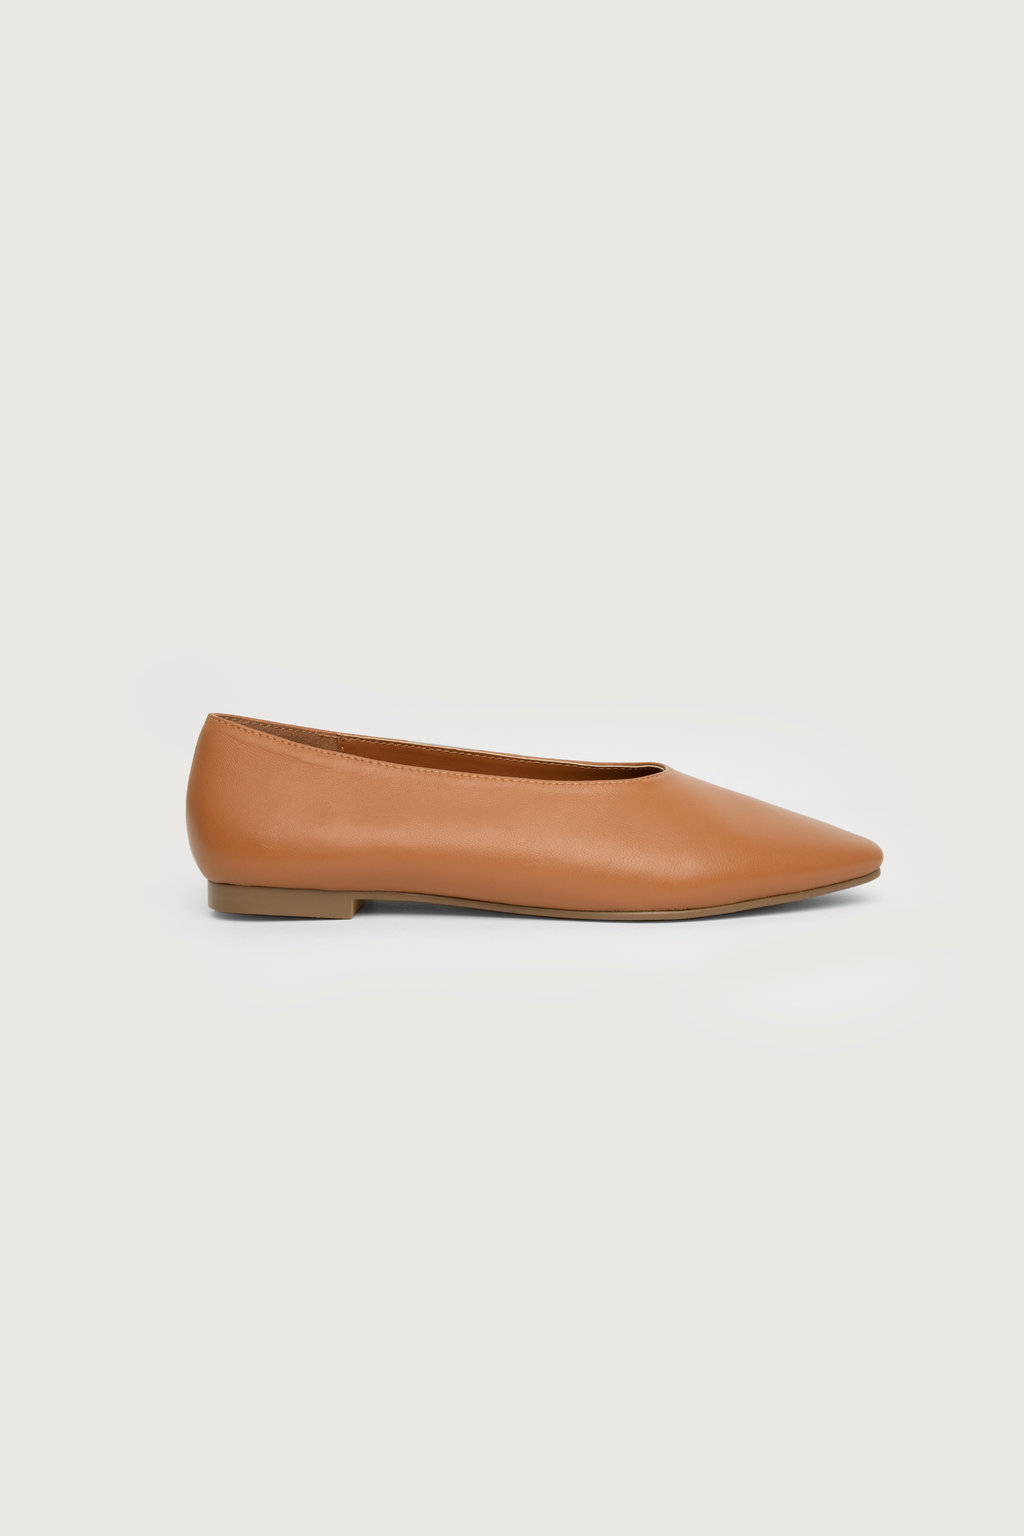 Flat 3358 Terracotta 2